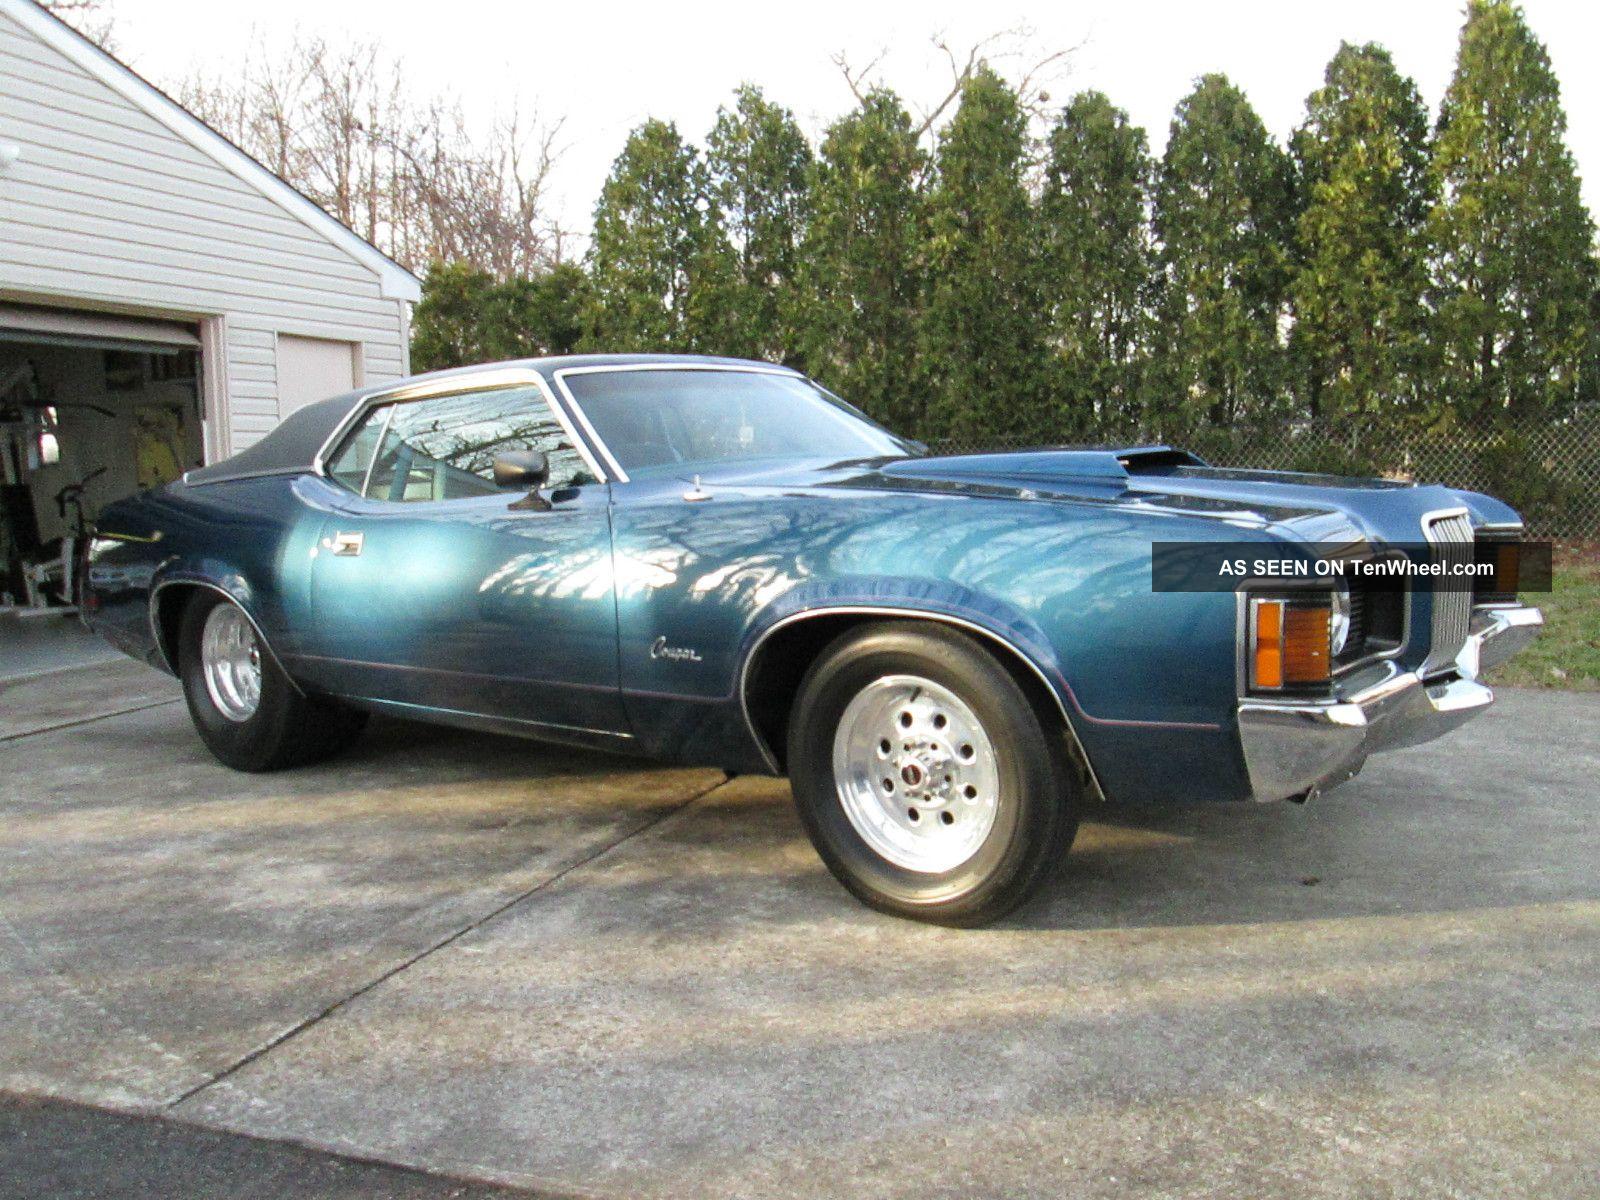 1971 Mercury Cougar - Muscle Car - Prostreet / Show Car / Race Car